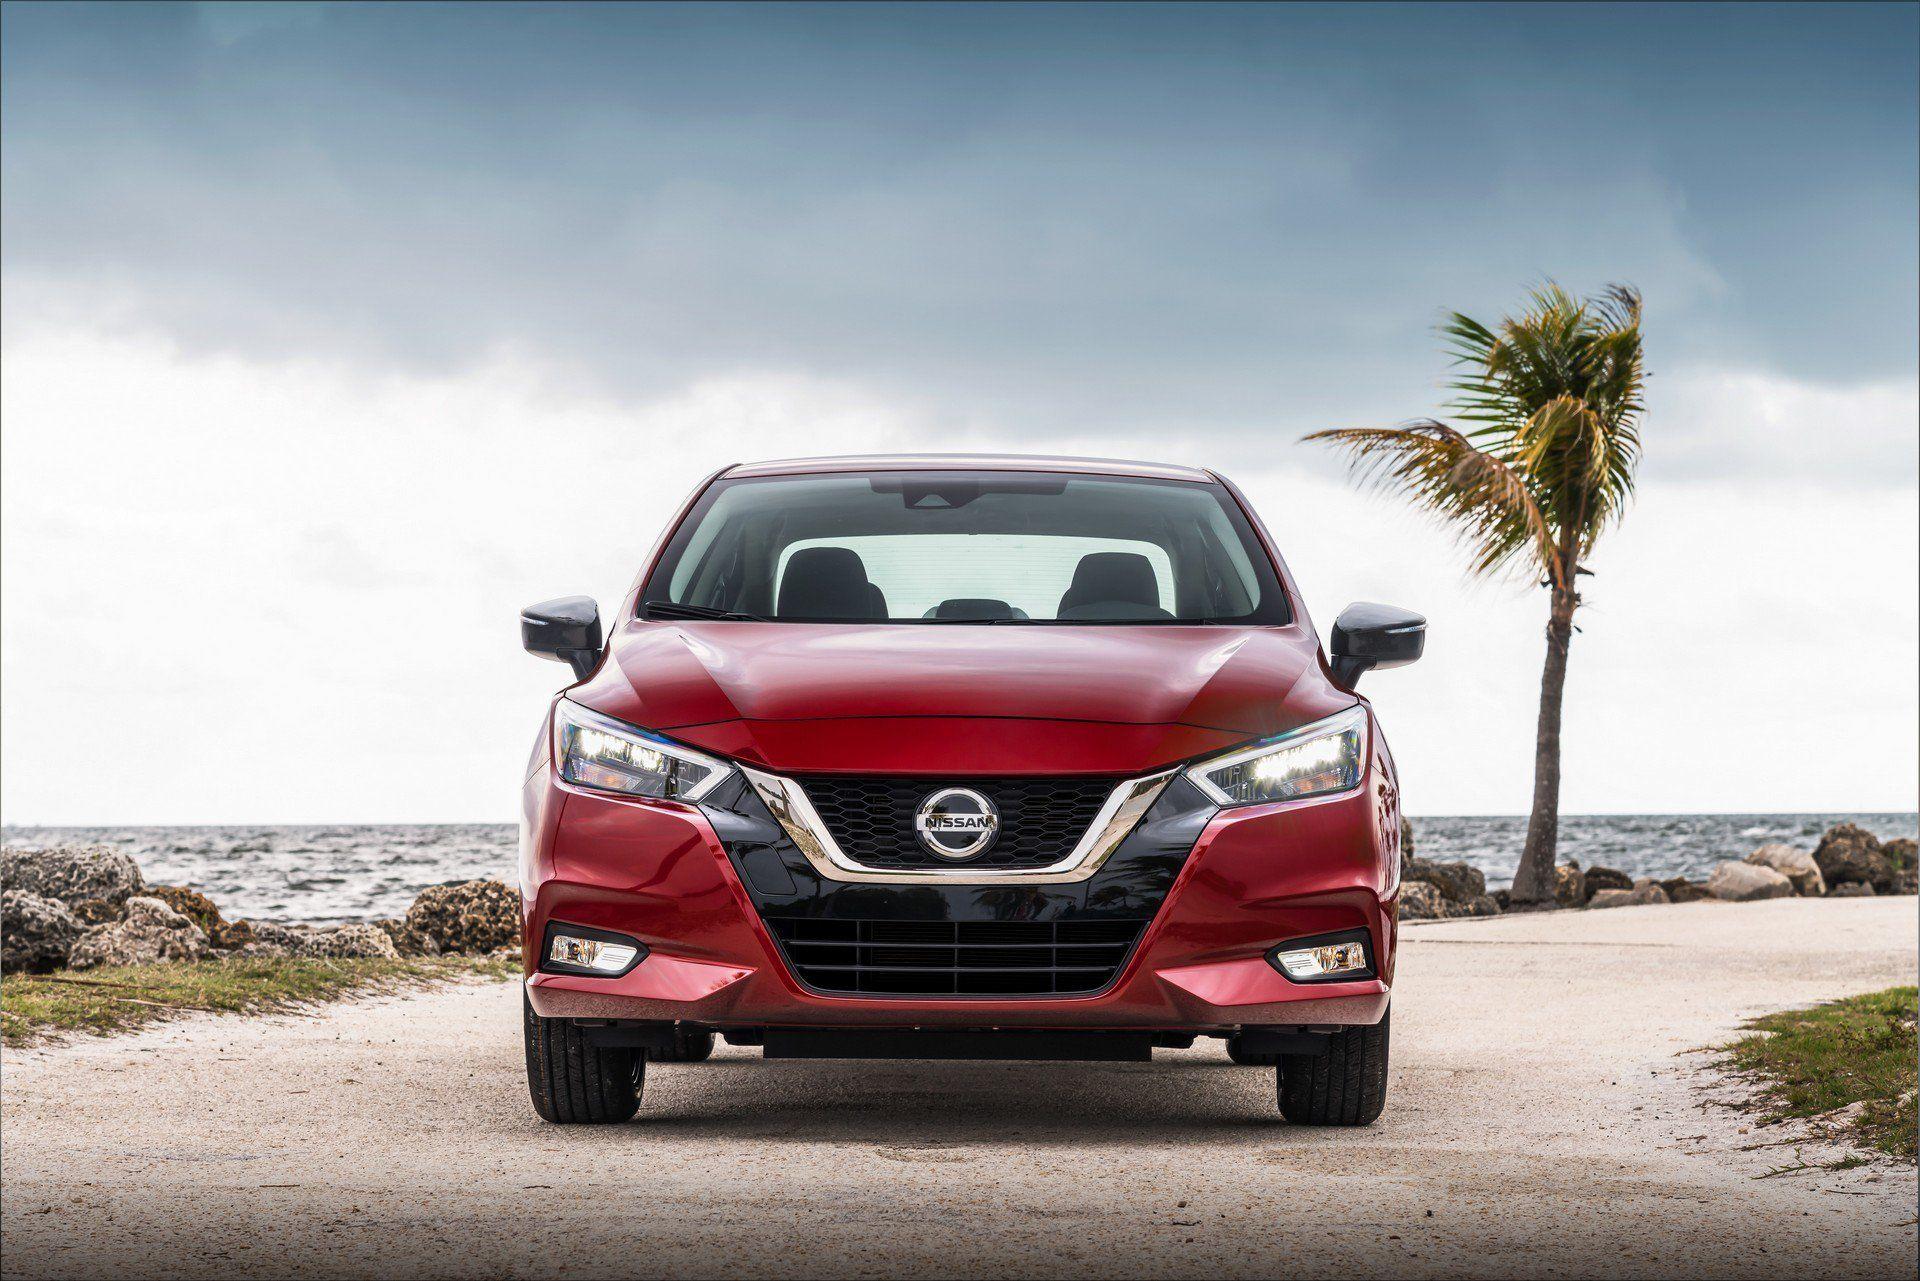 Thiết Kế đầu Xe Nissan Sunny 2020 Nissan Mua He